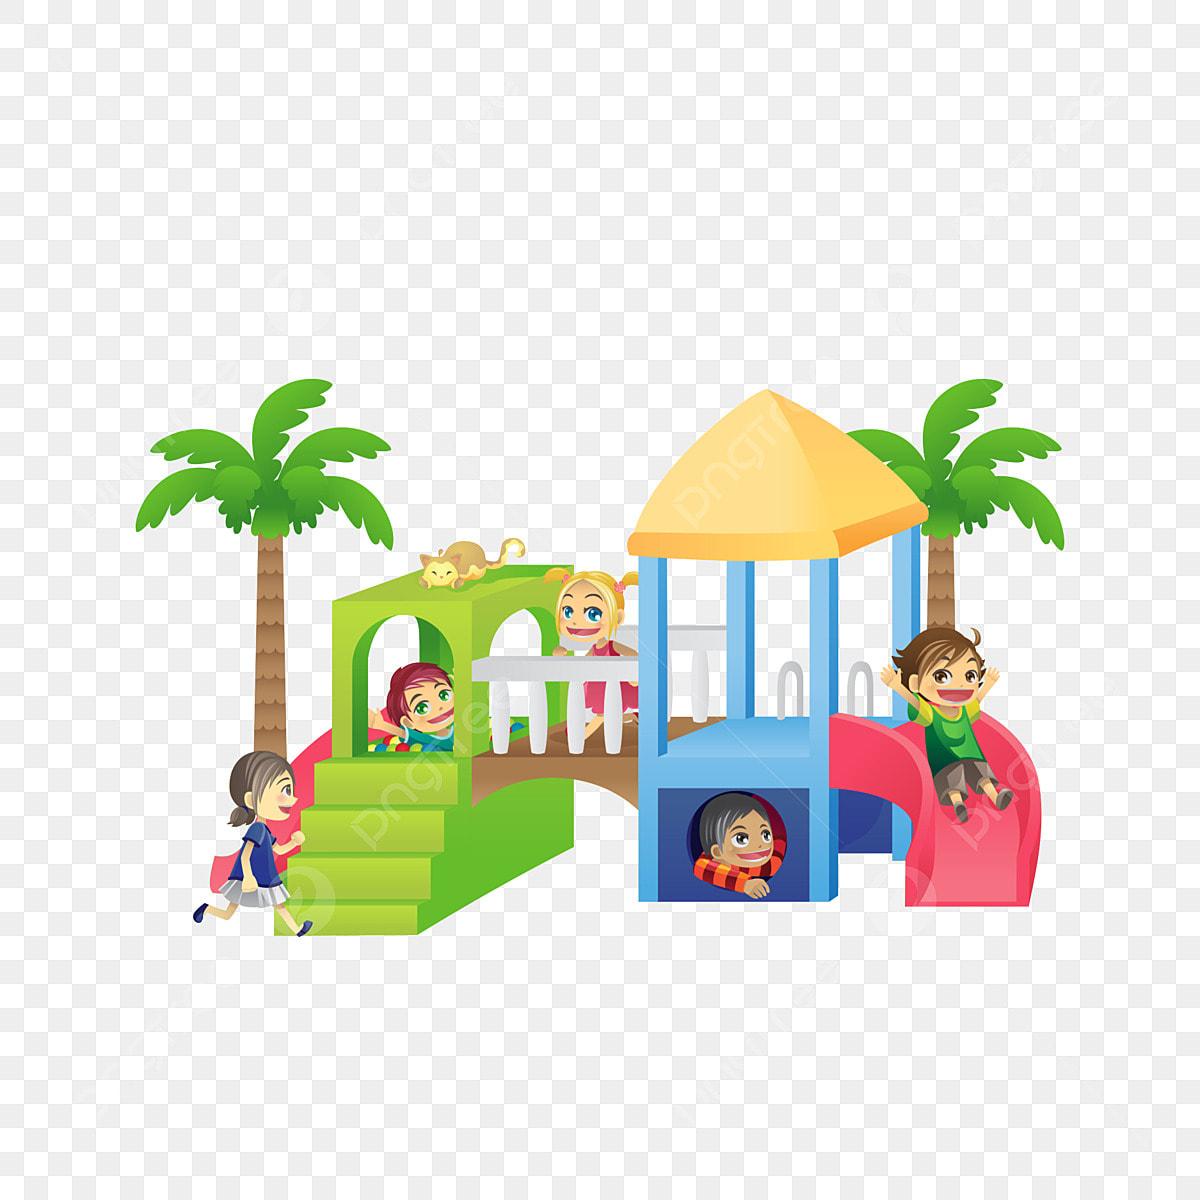 Playground Clipart Playground Clip Art Slide Graphic Merry | Etsy